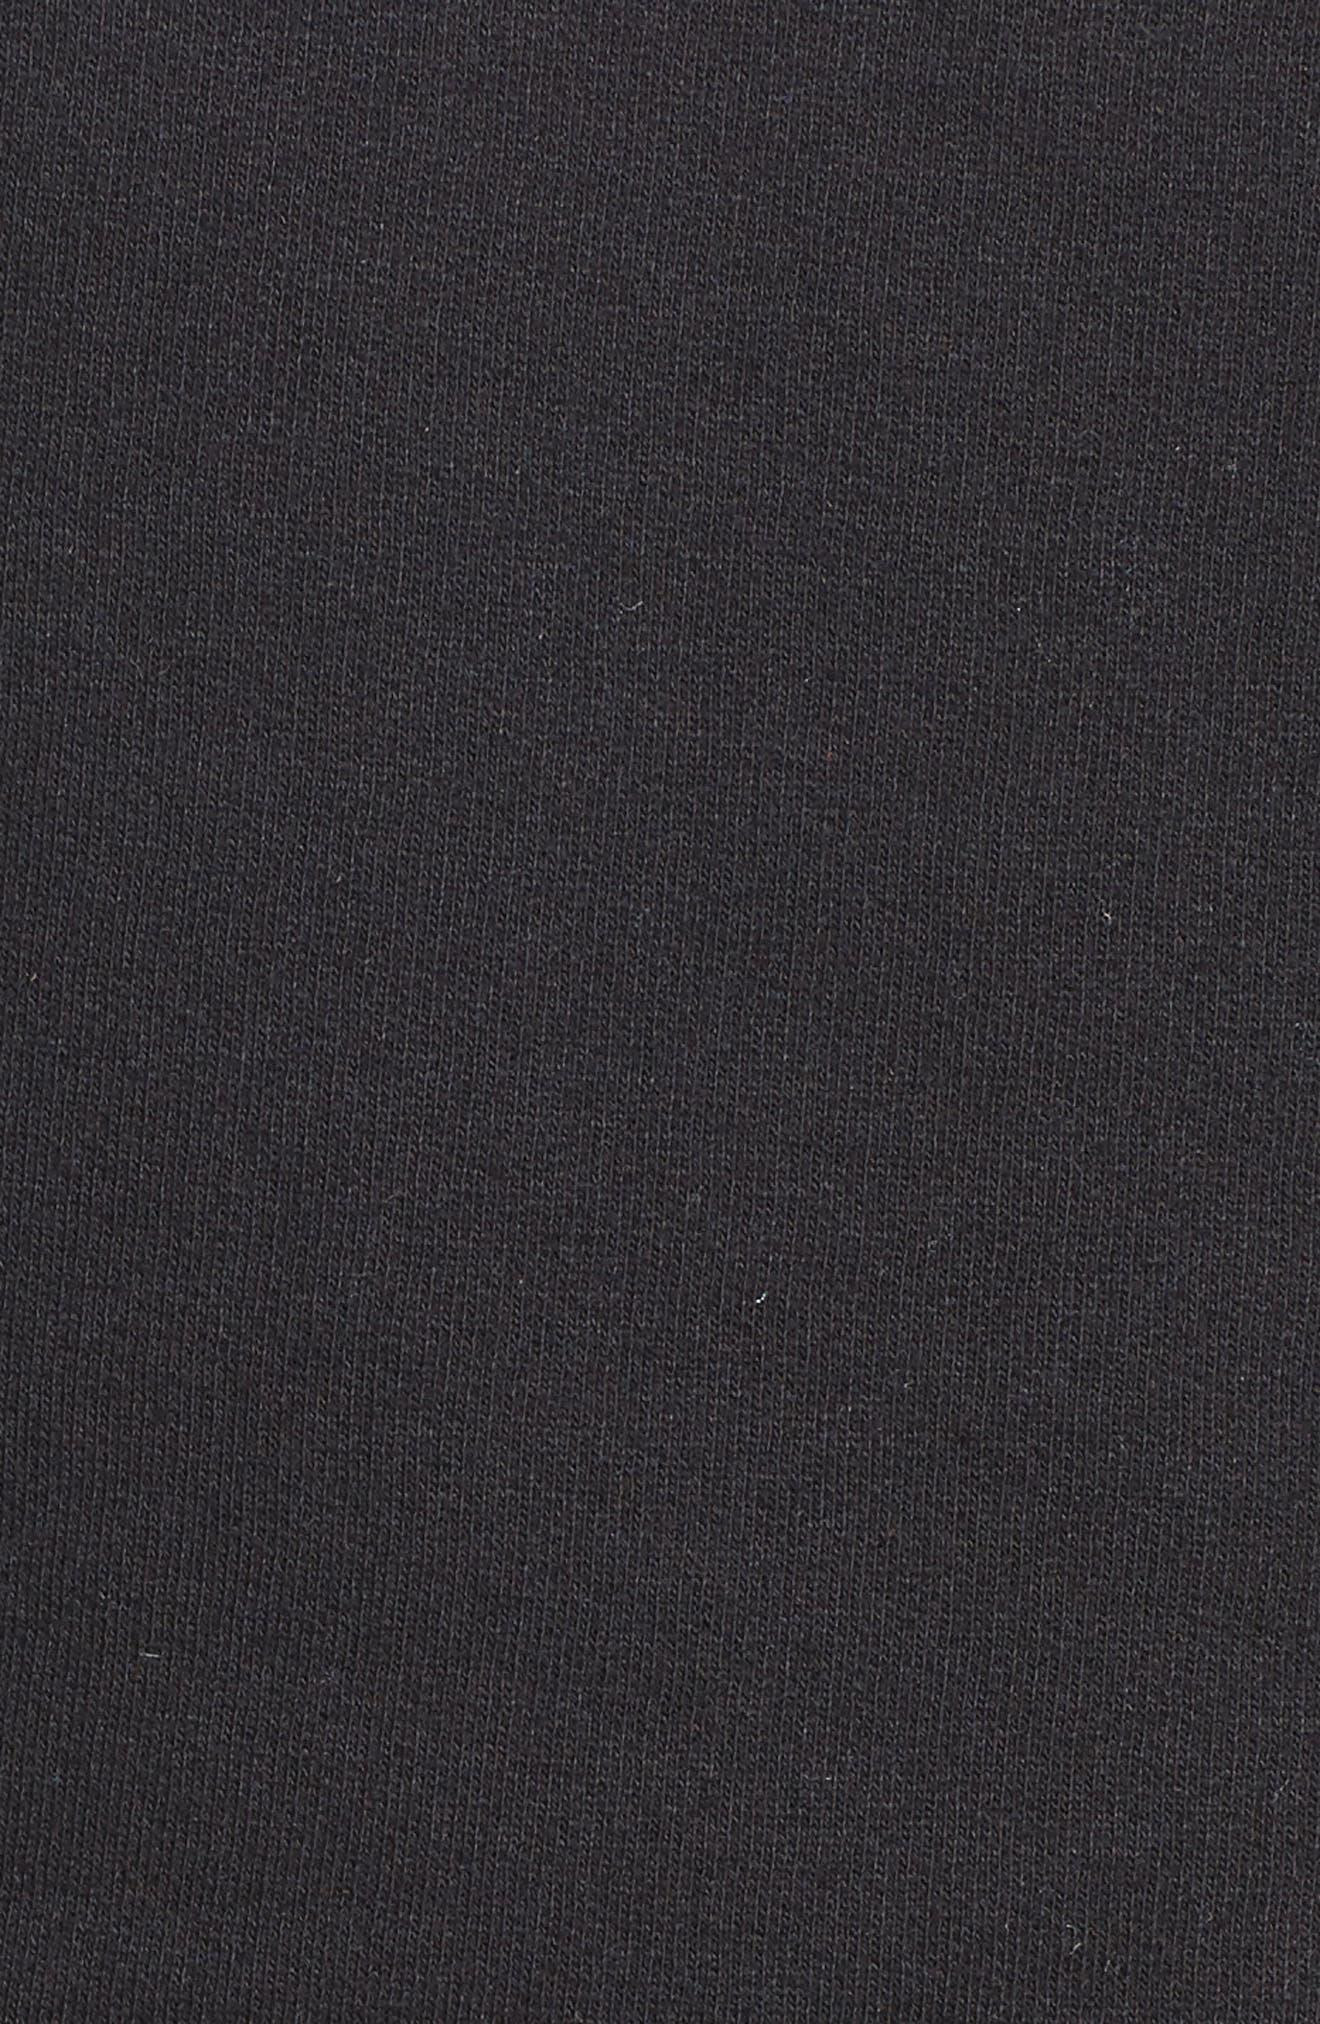 Alternate Image 5  - BRUNETTE the Label 'This Wine' Crewneck Sweatshirt